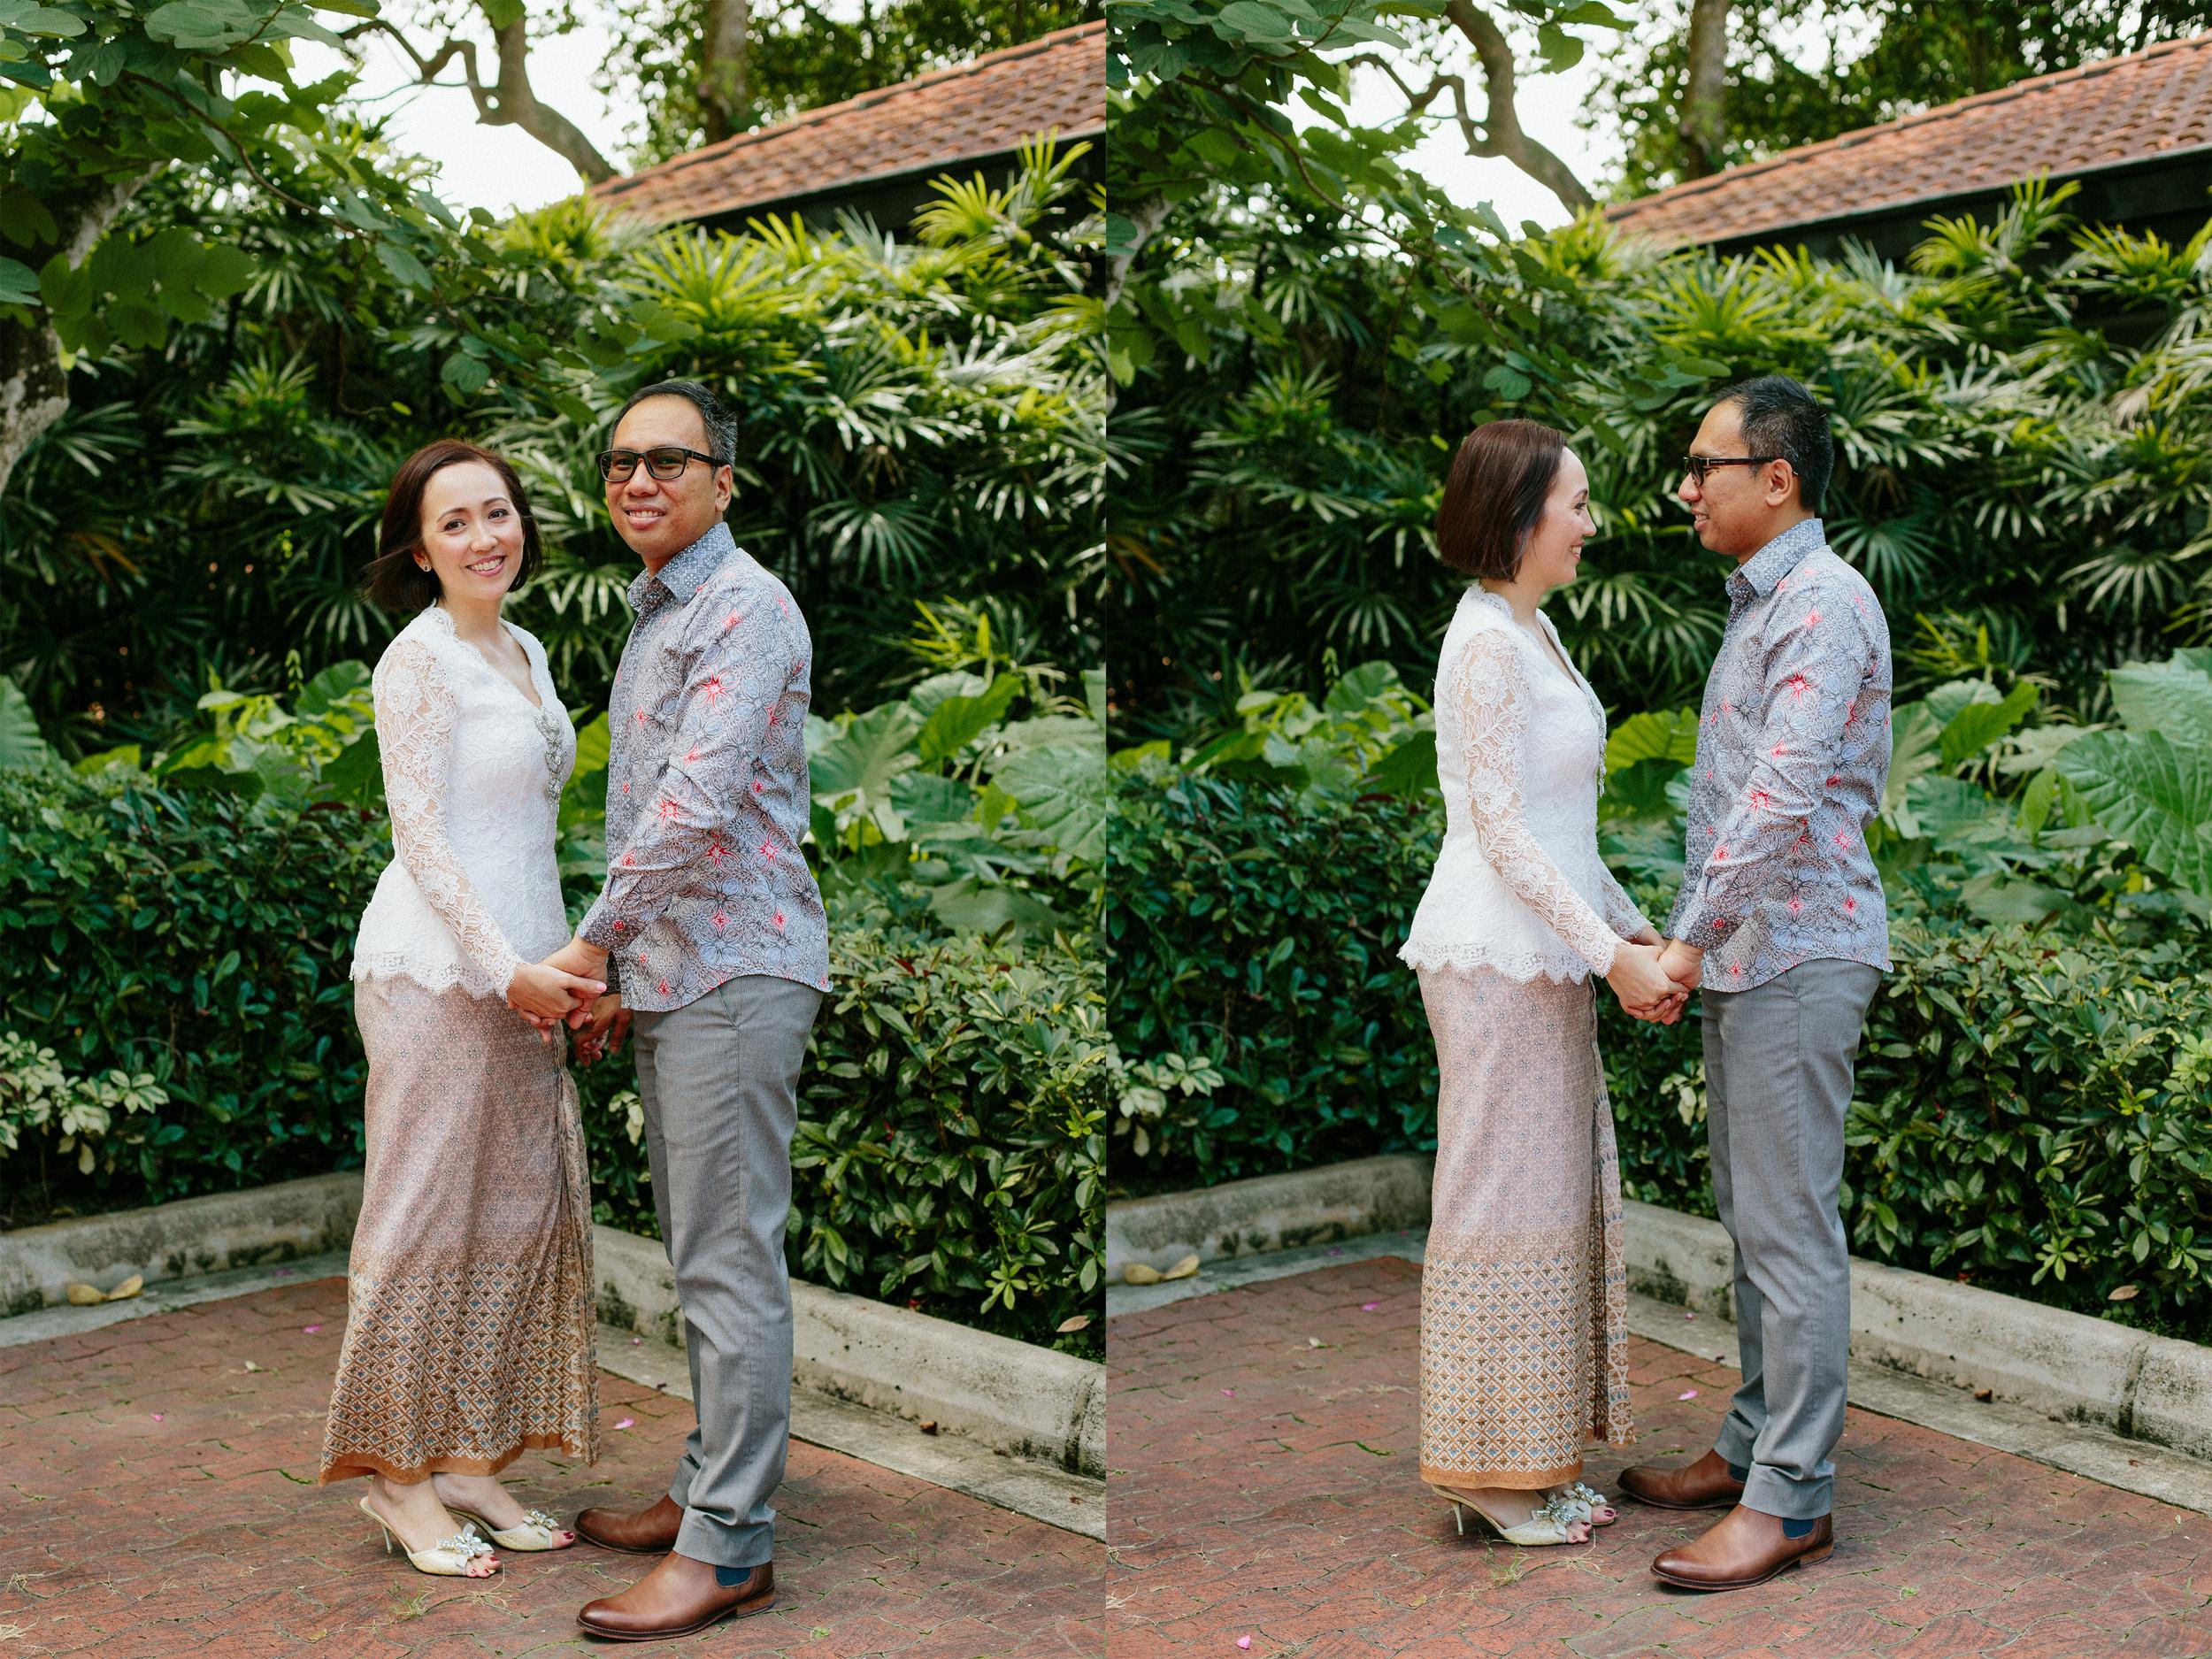 singapore-wedding-photographer-photography-wmt2017-083.jpg